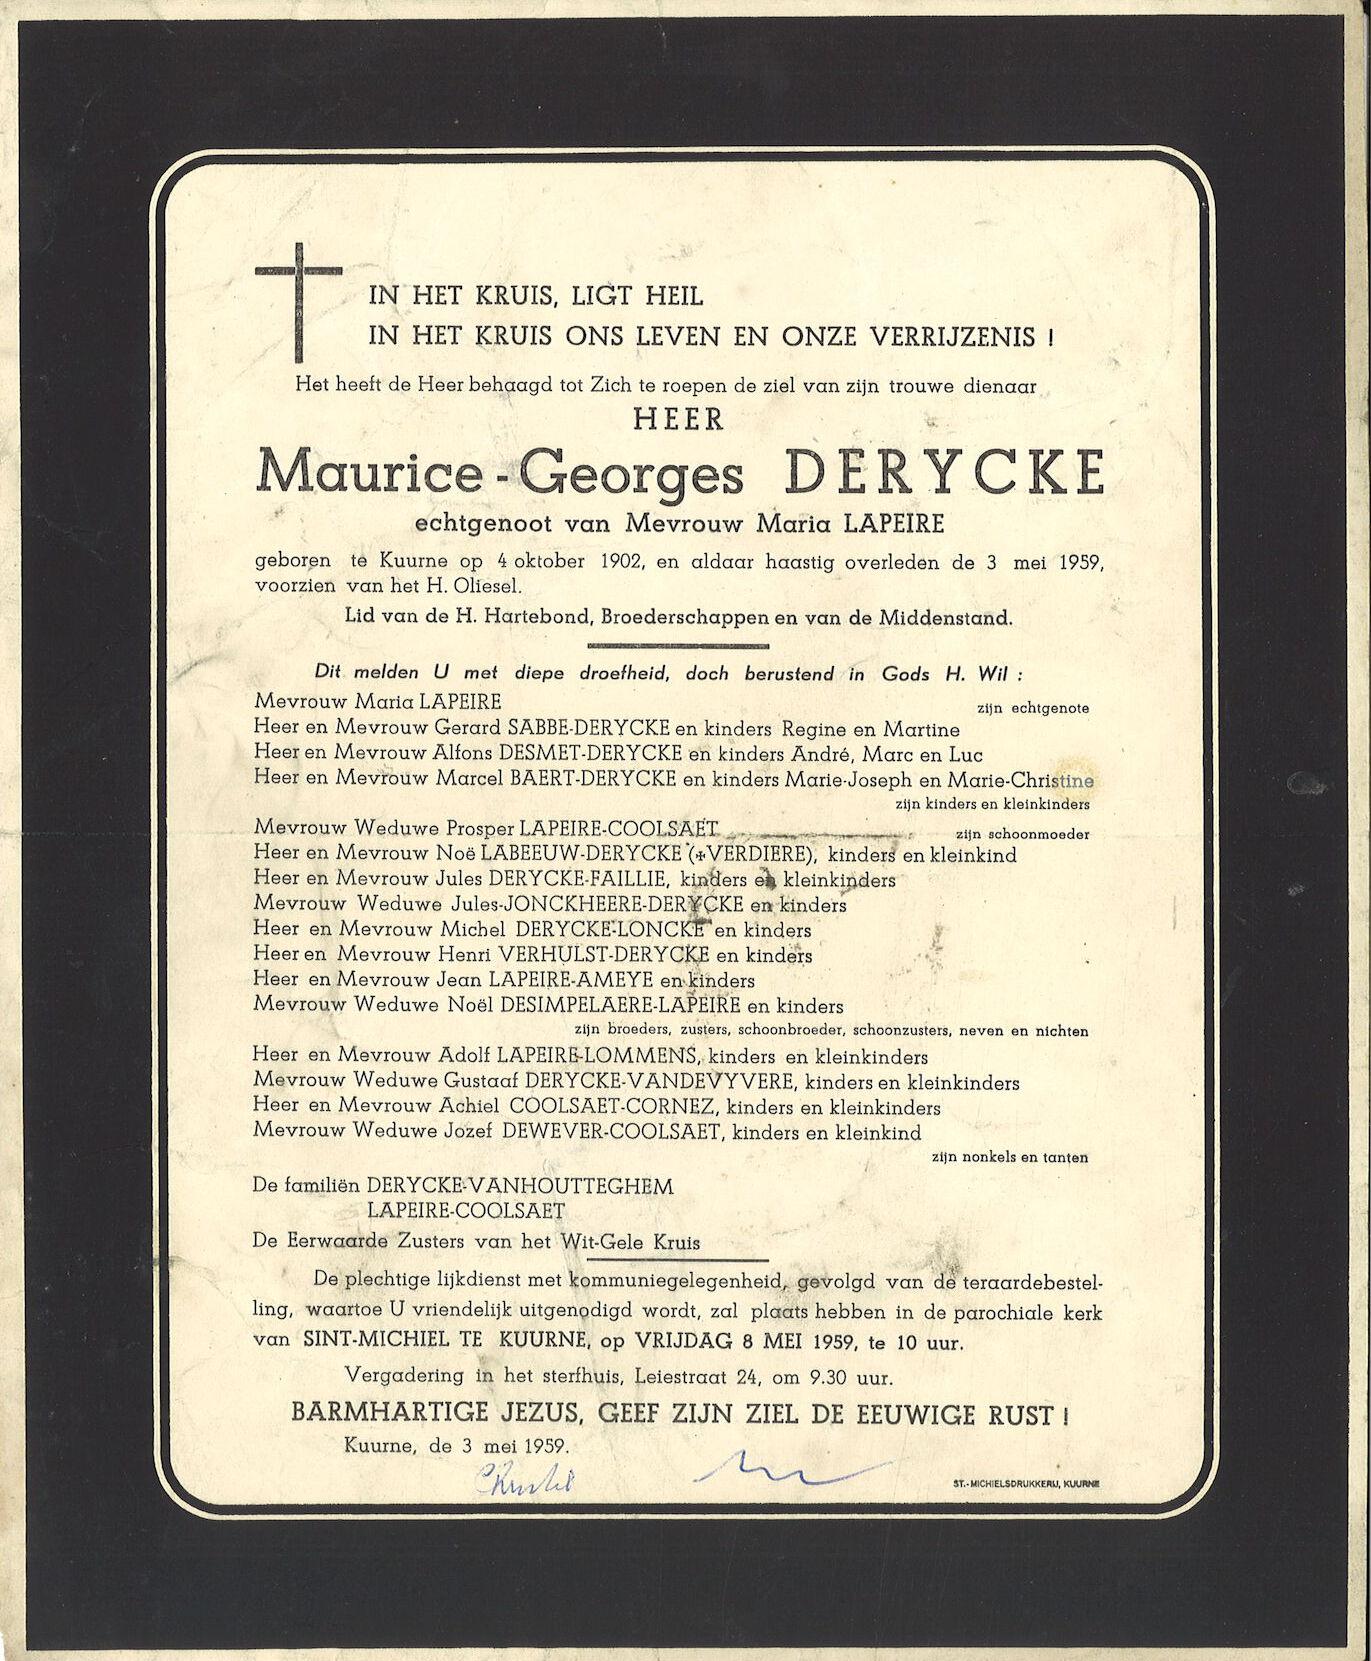 Maurice-Georges Derycke